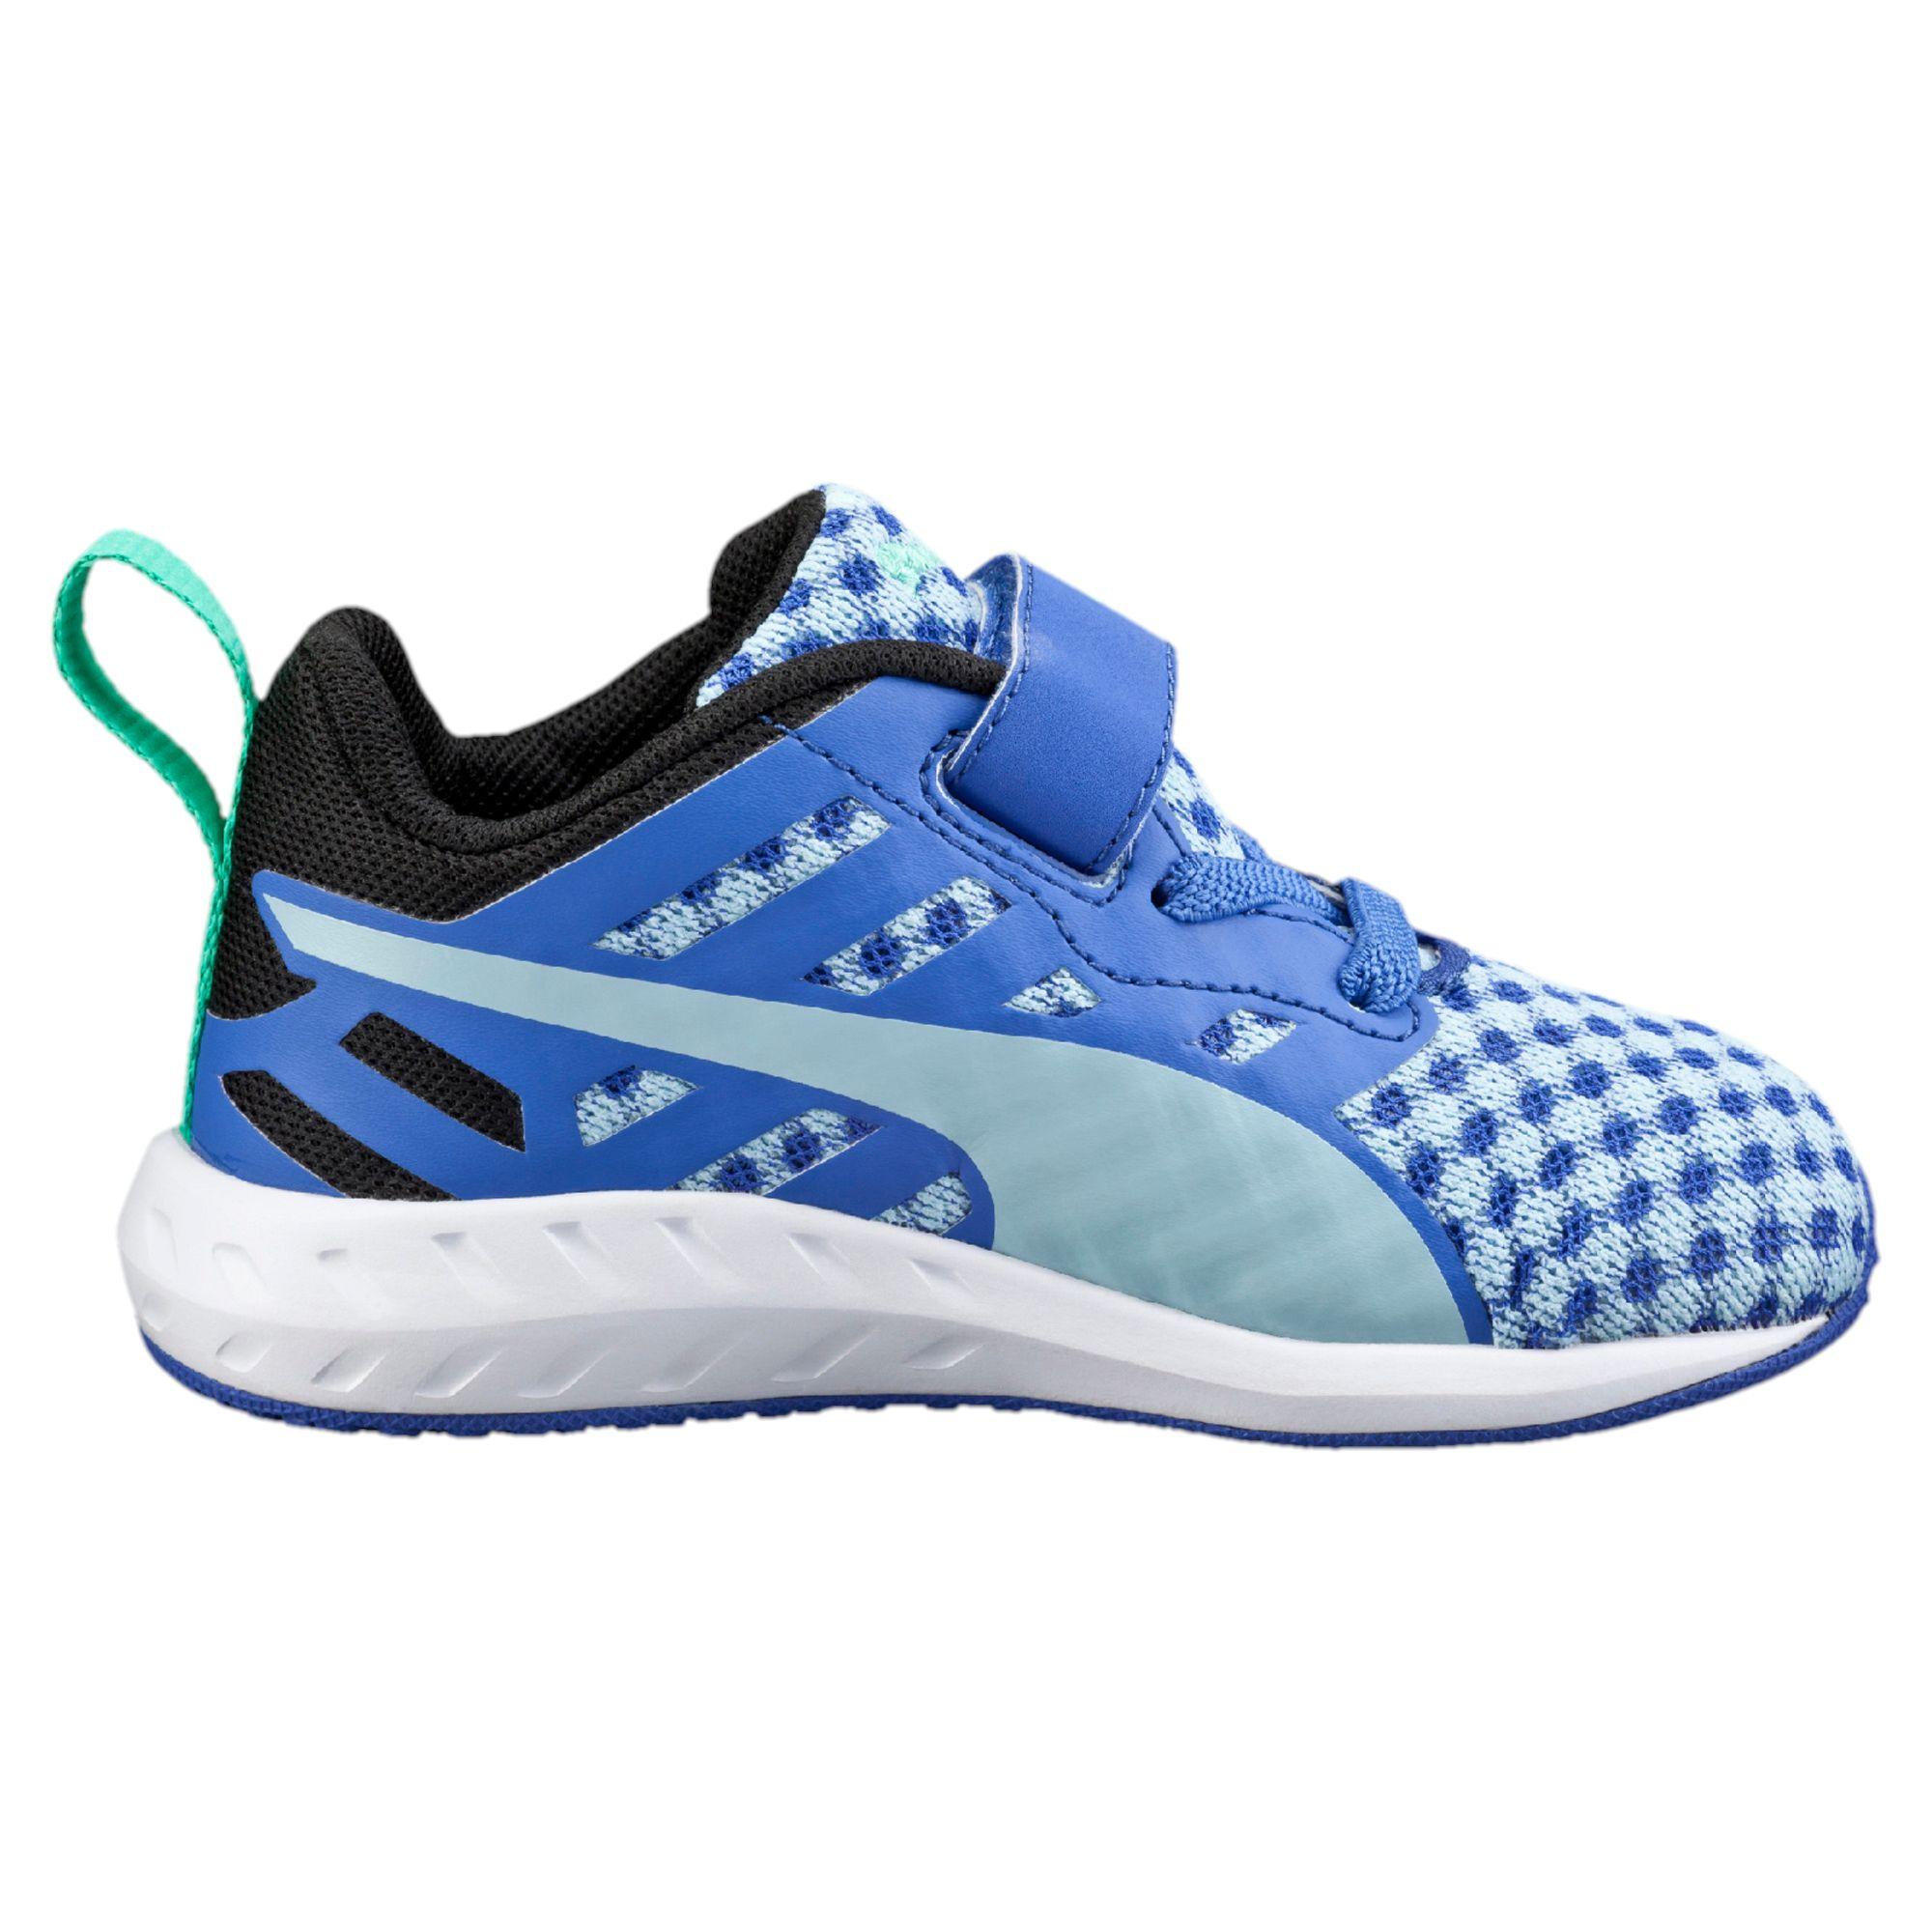 Puma Flare Kids Running Shoes